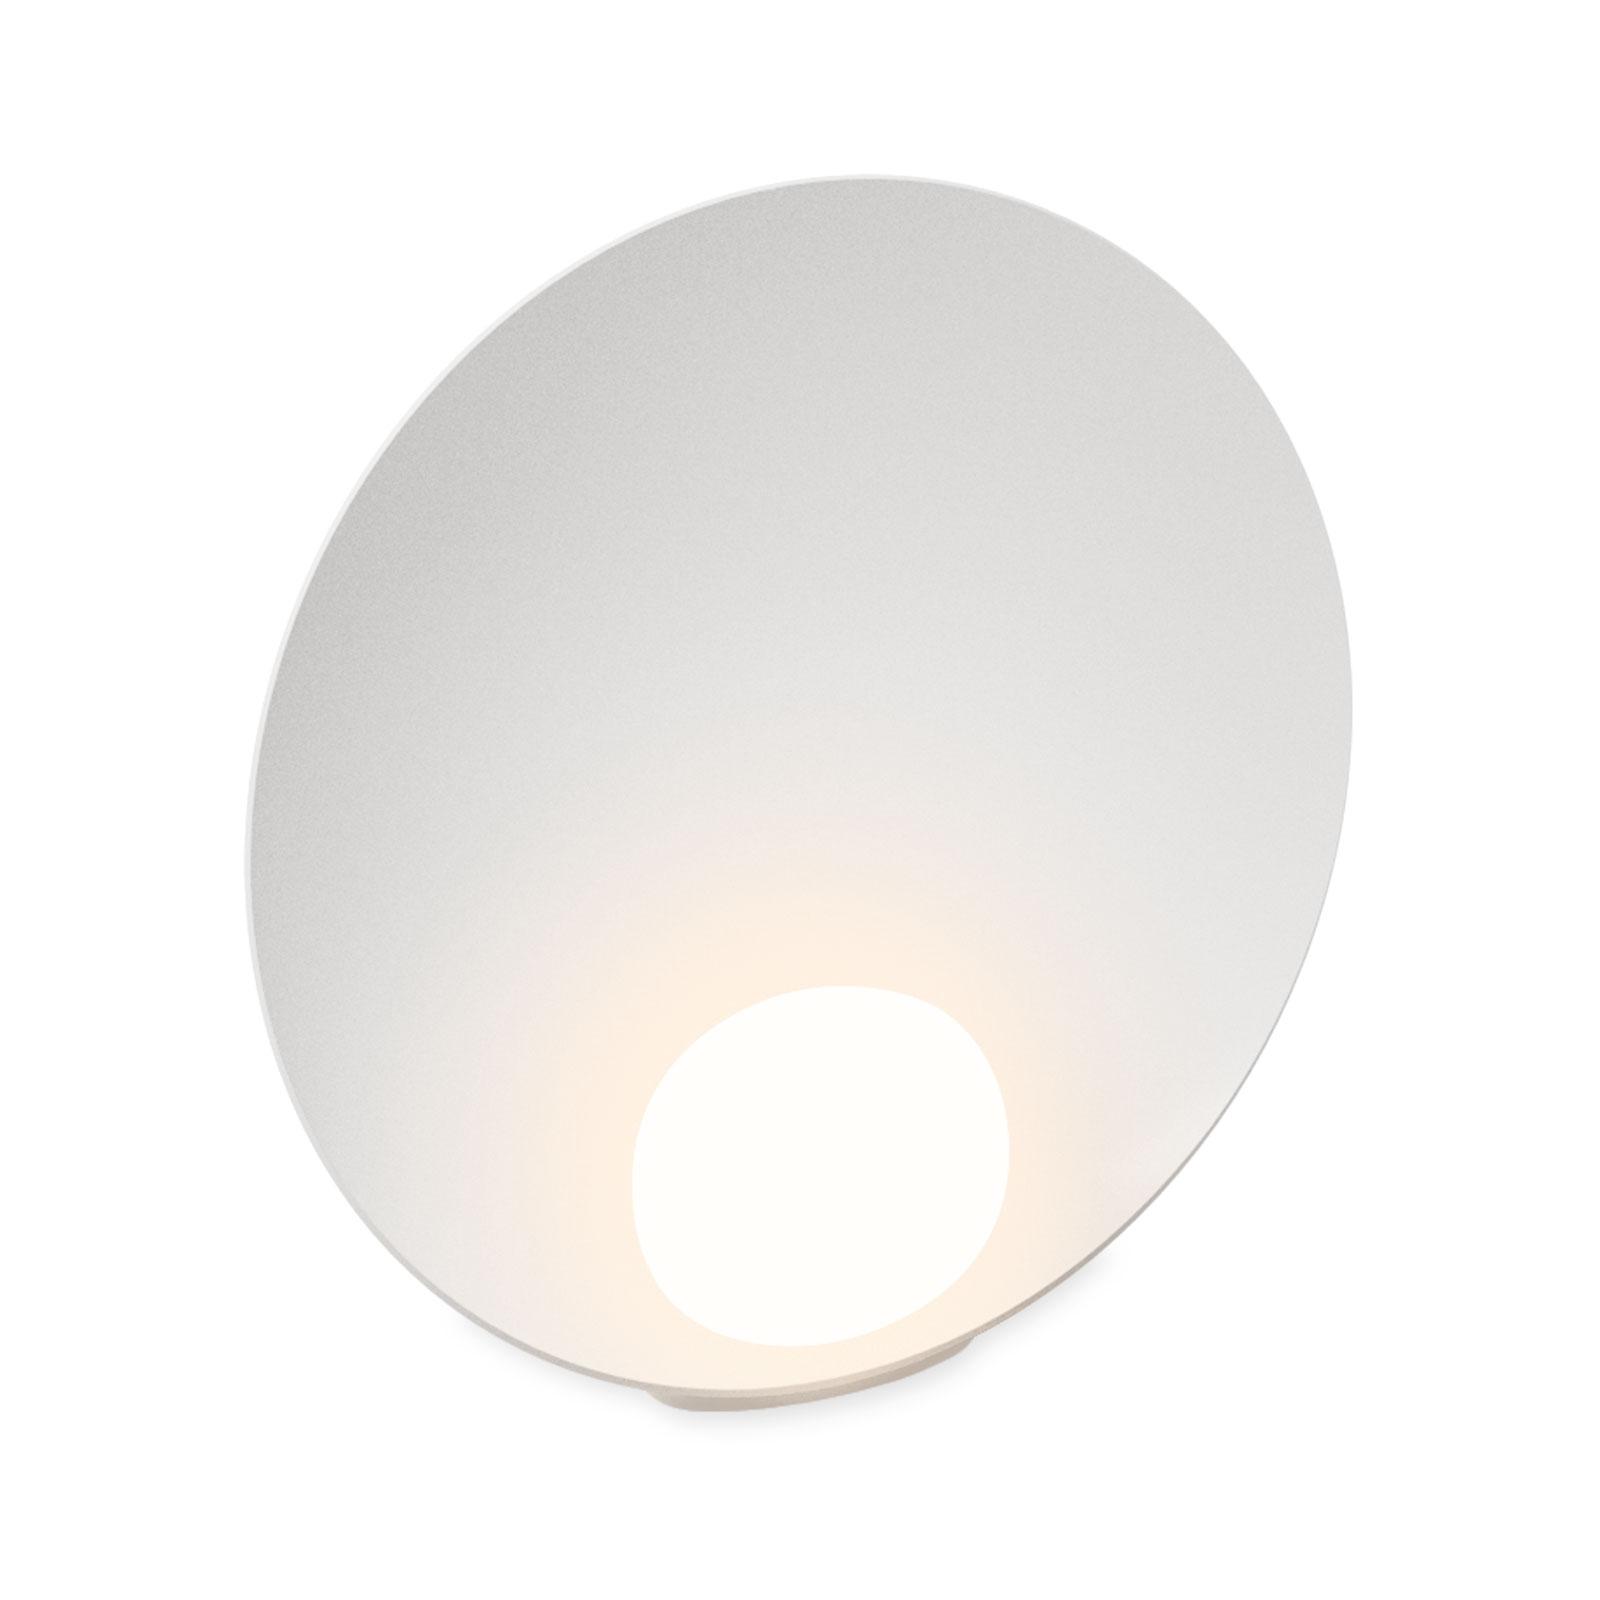 Vibia Musa 7400 lampe à poser LED debout, blanche